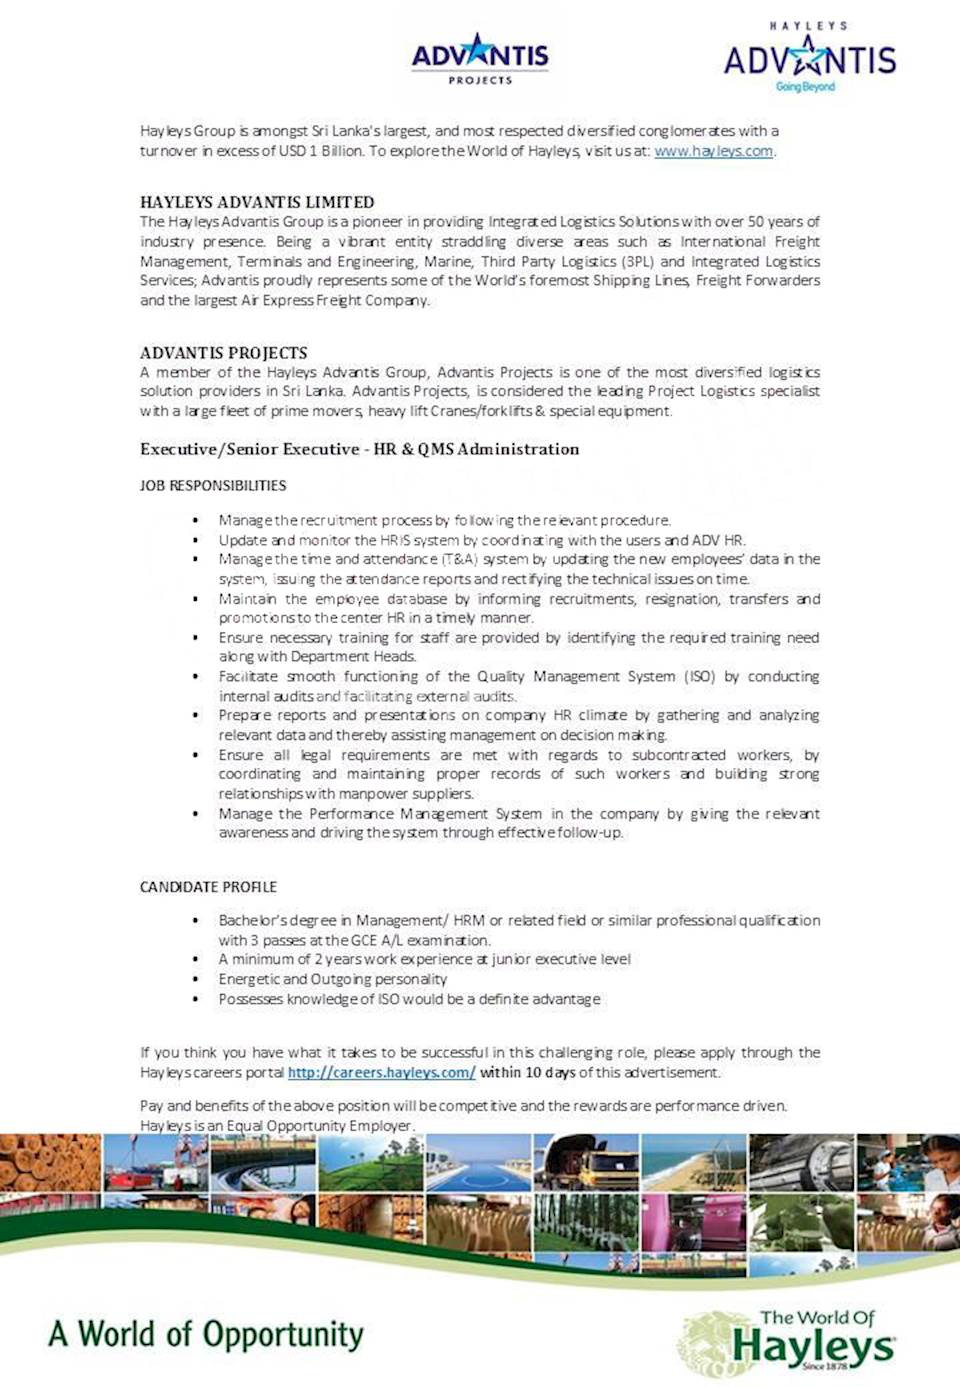 Executive / Senior Executive - HR and QMS Administration at